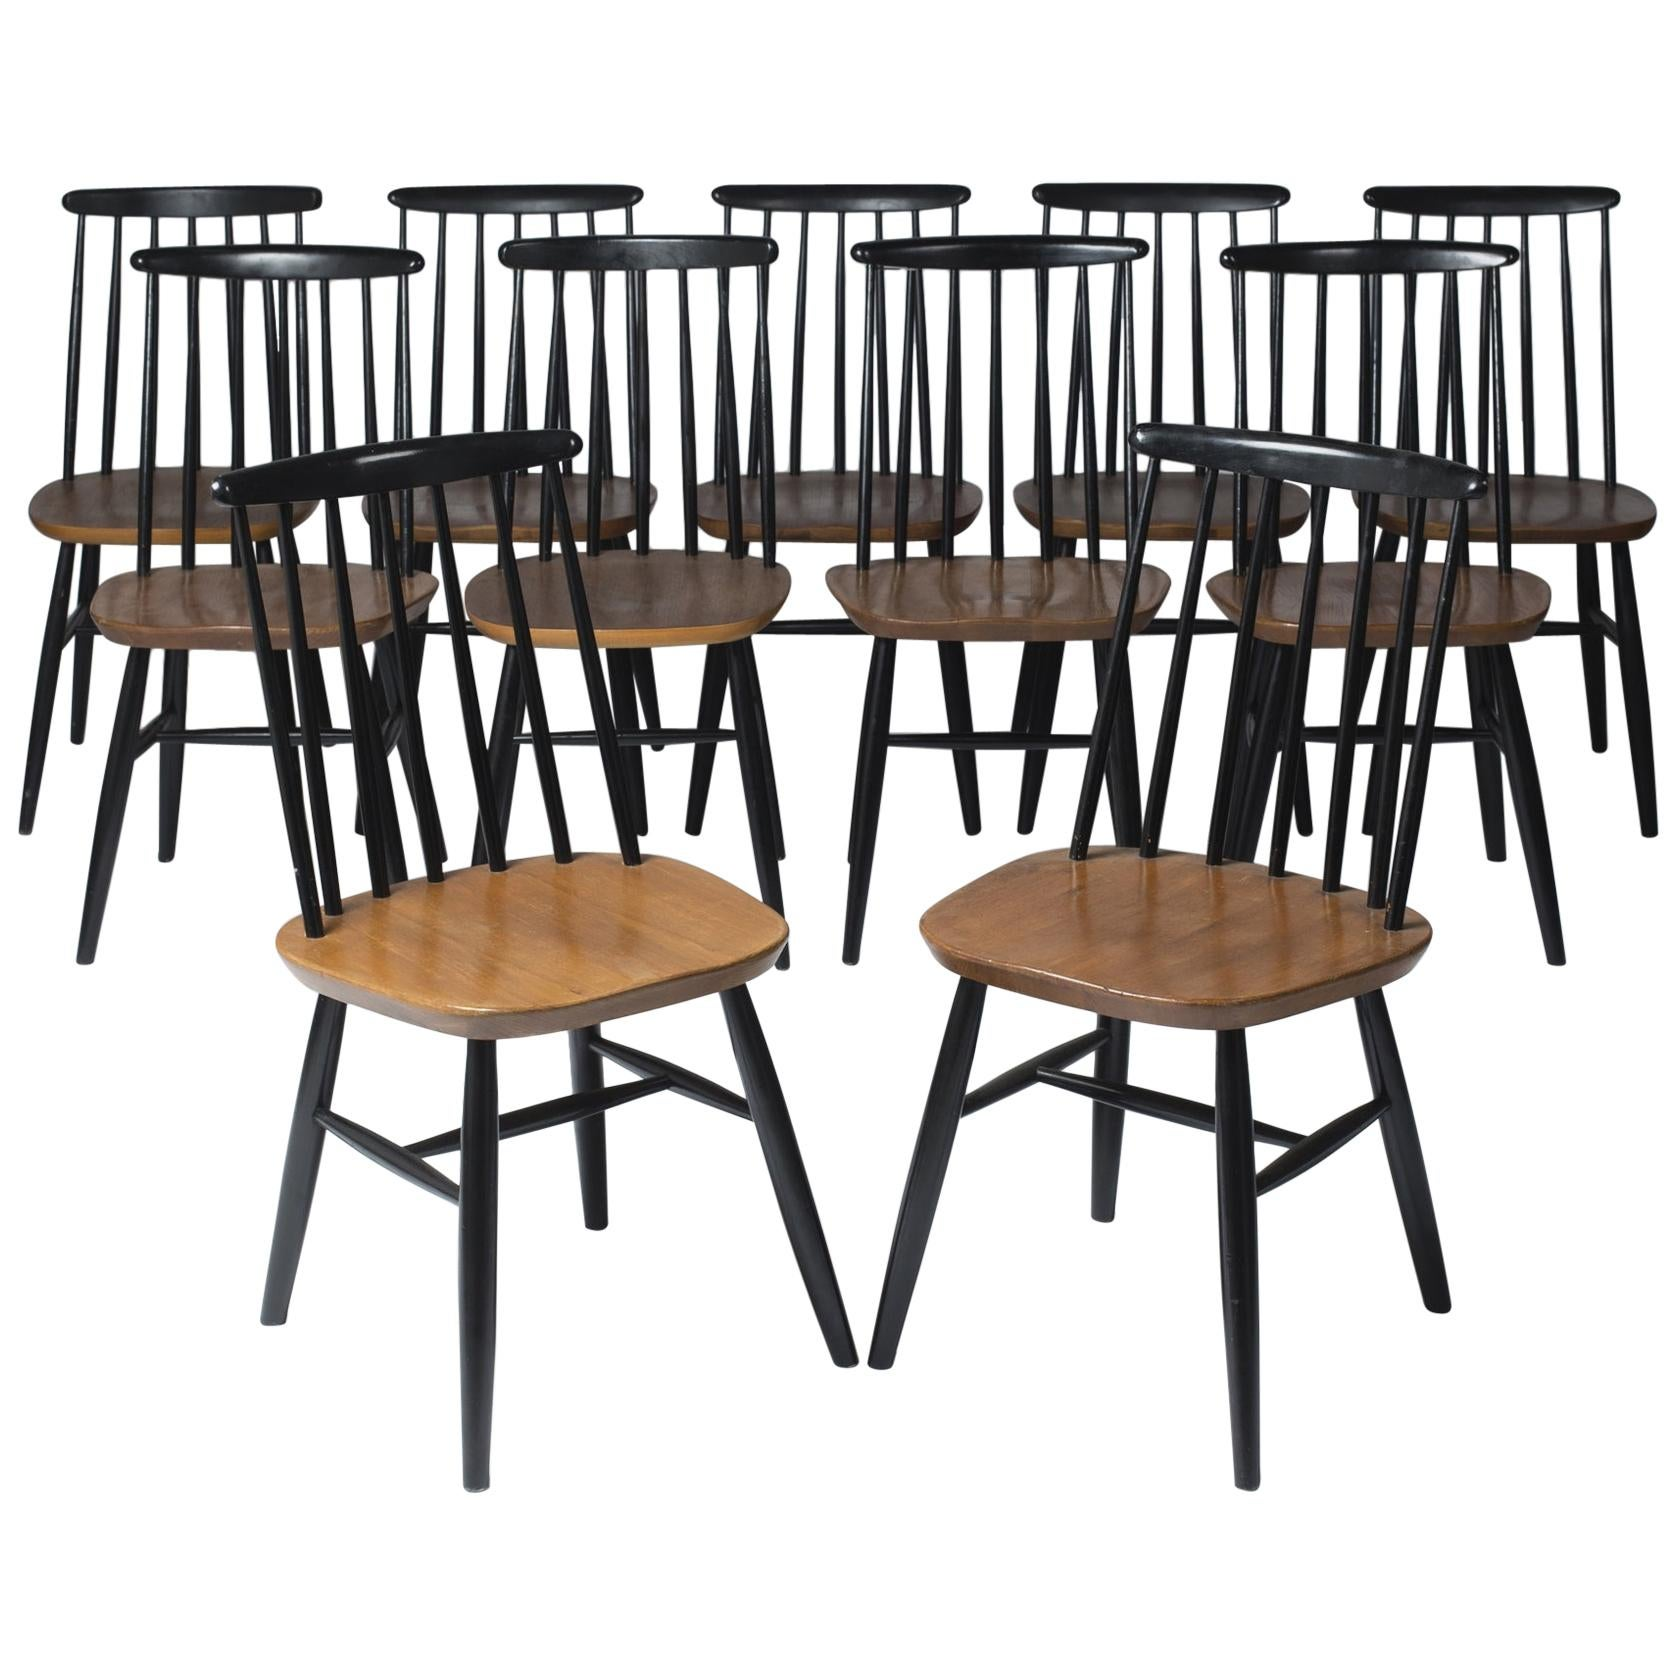 Set of Eleven Chairs by Ilmari Tapiovaara, Finland, circa 1960